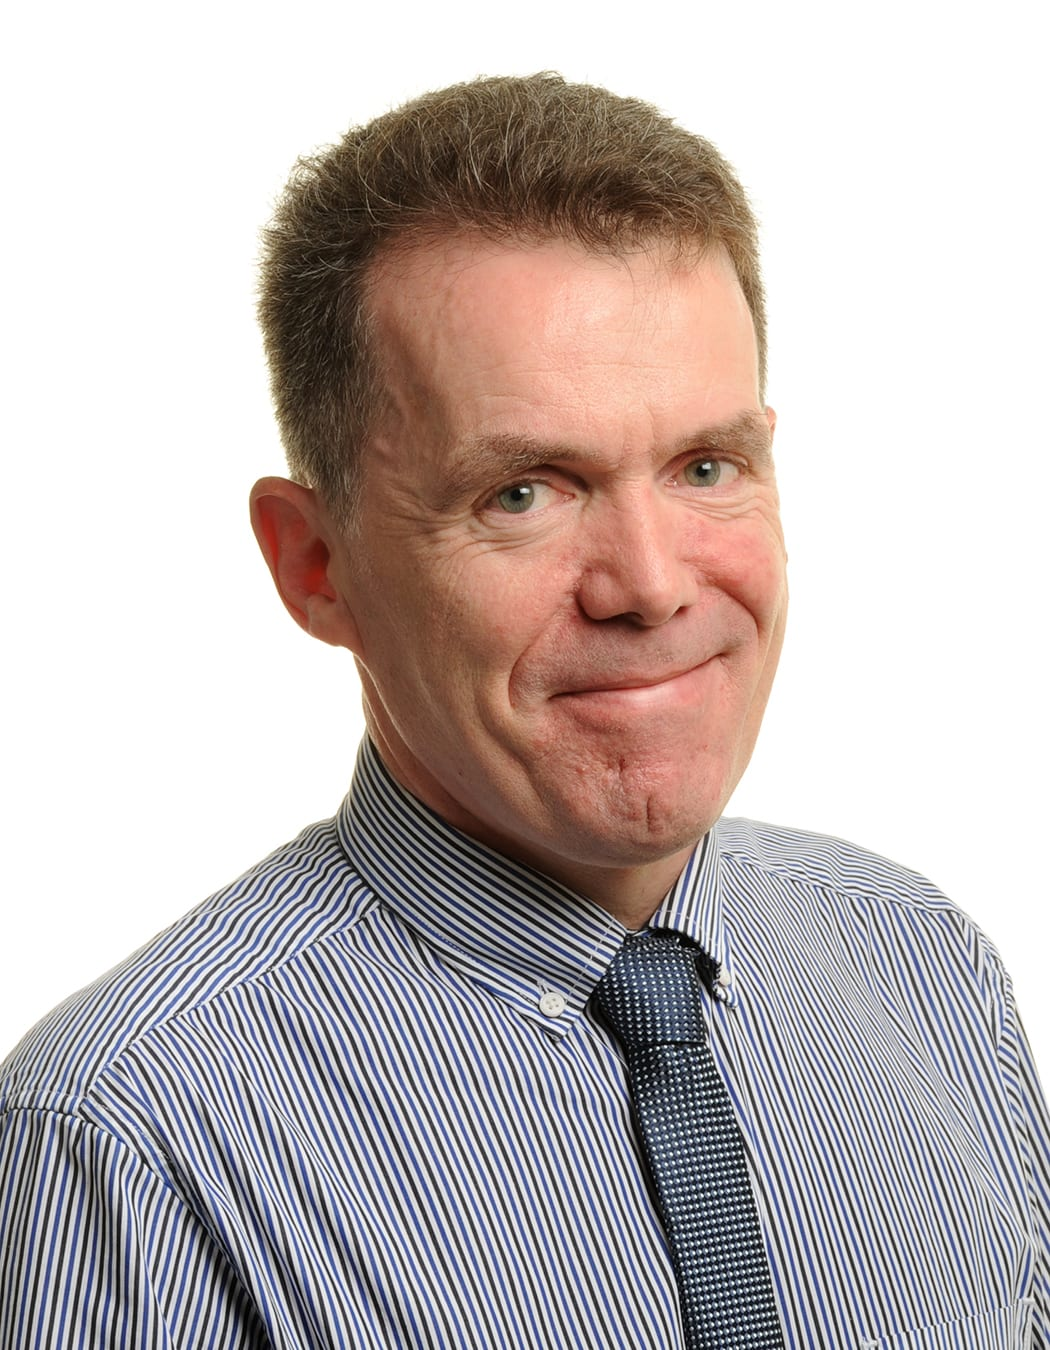 Professor Neil Vargesson